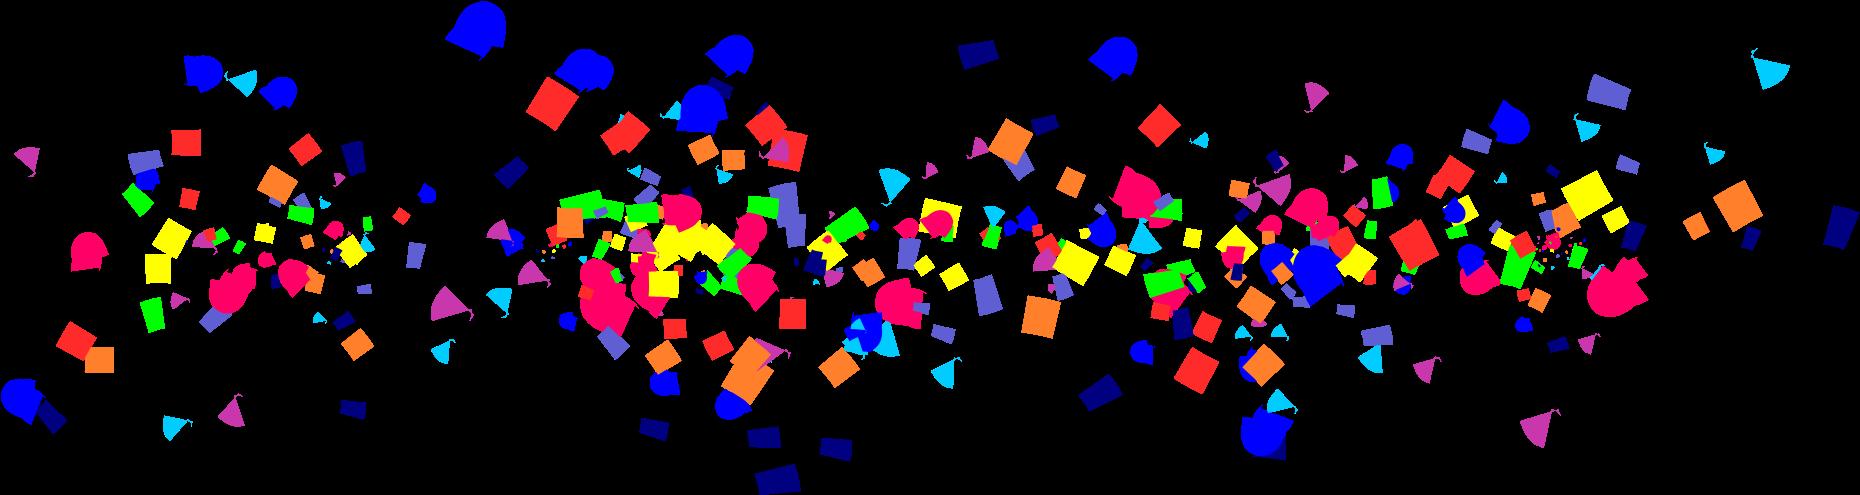 Download Svg Clipart Color Mix Big Image Png - Colored Dots